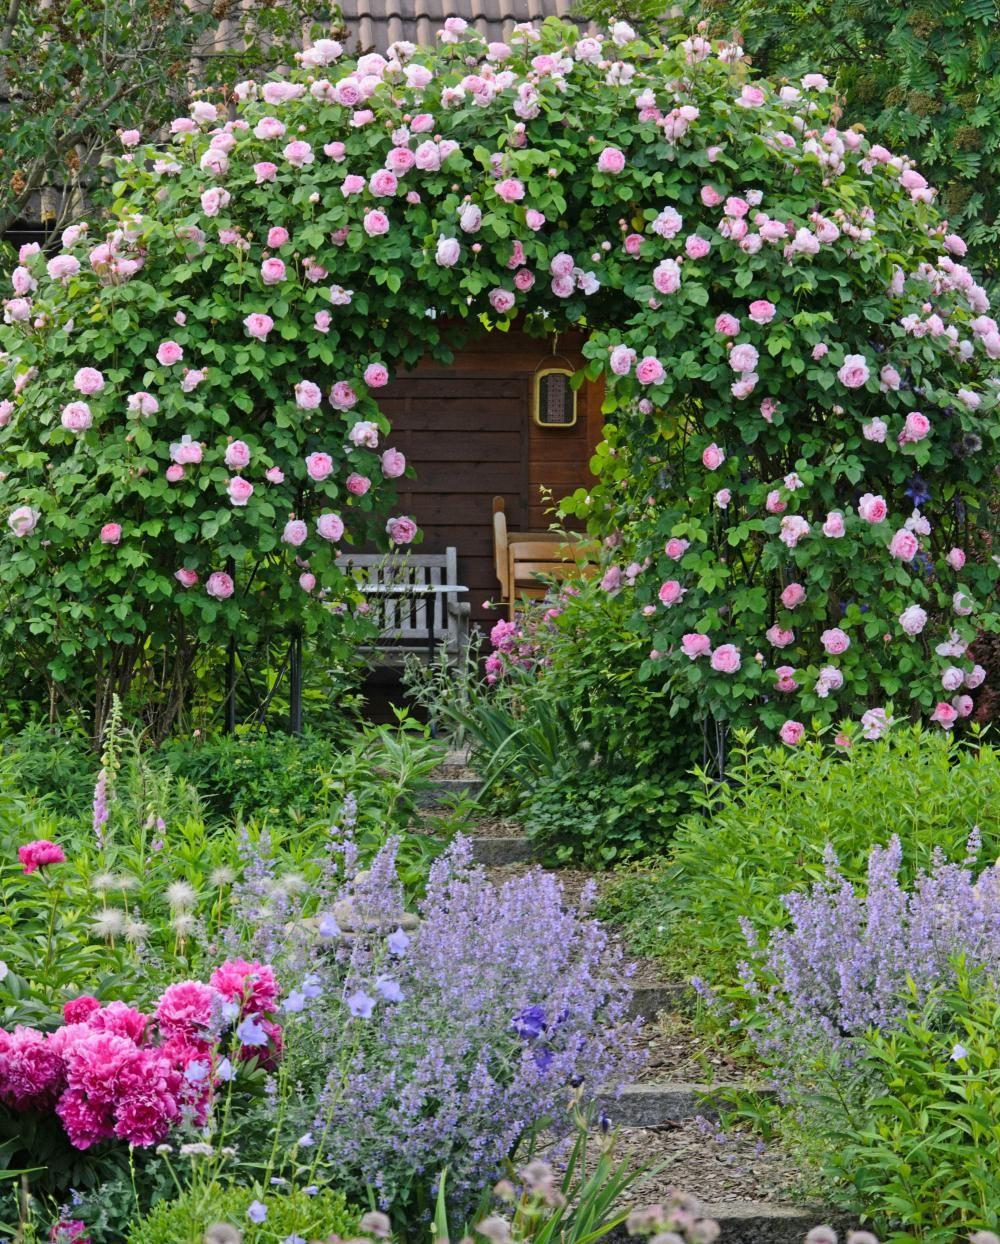 Rosengarten garden garten pinterest garten garten for Schoner wohnen janne